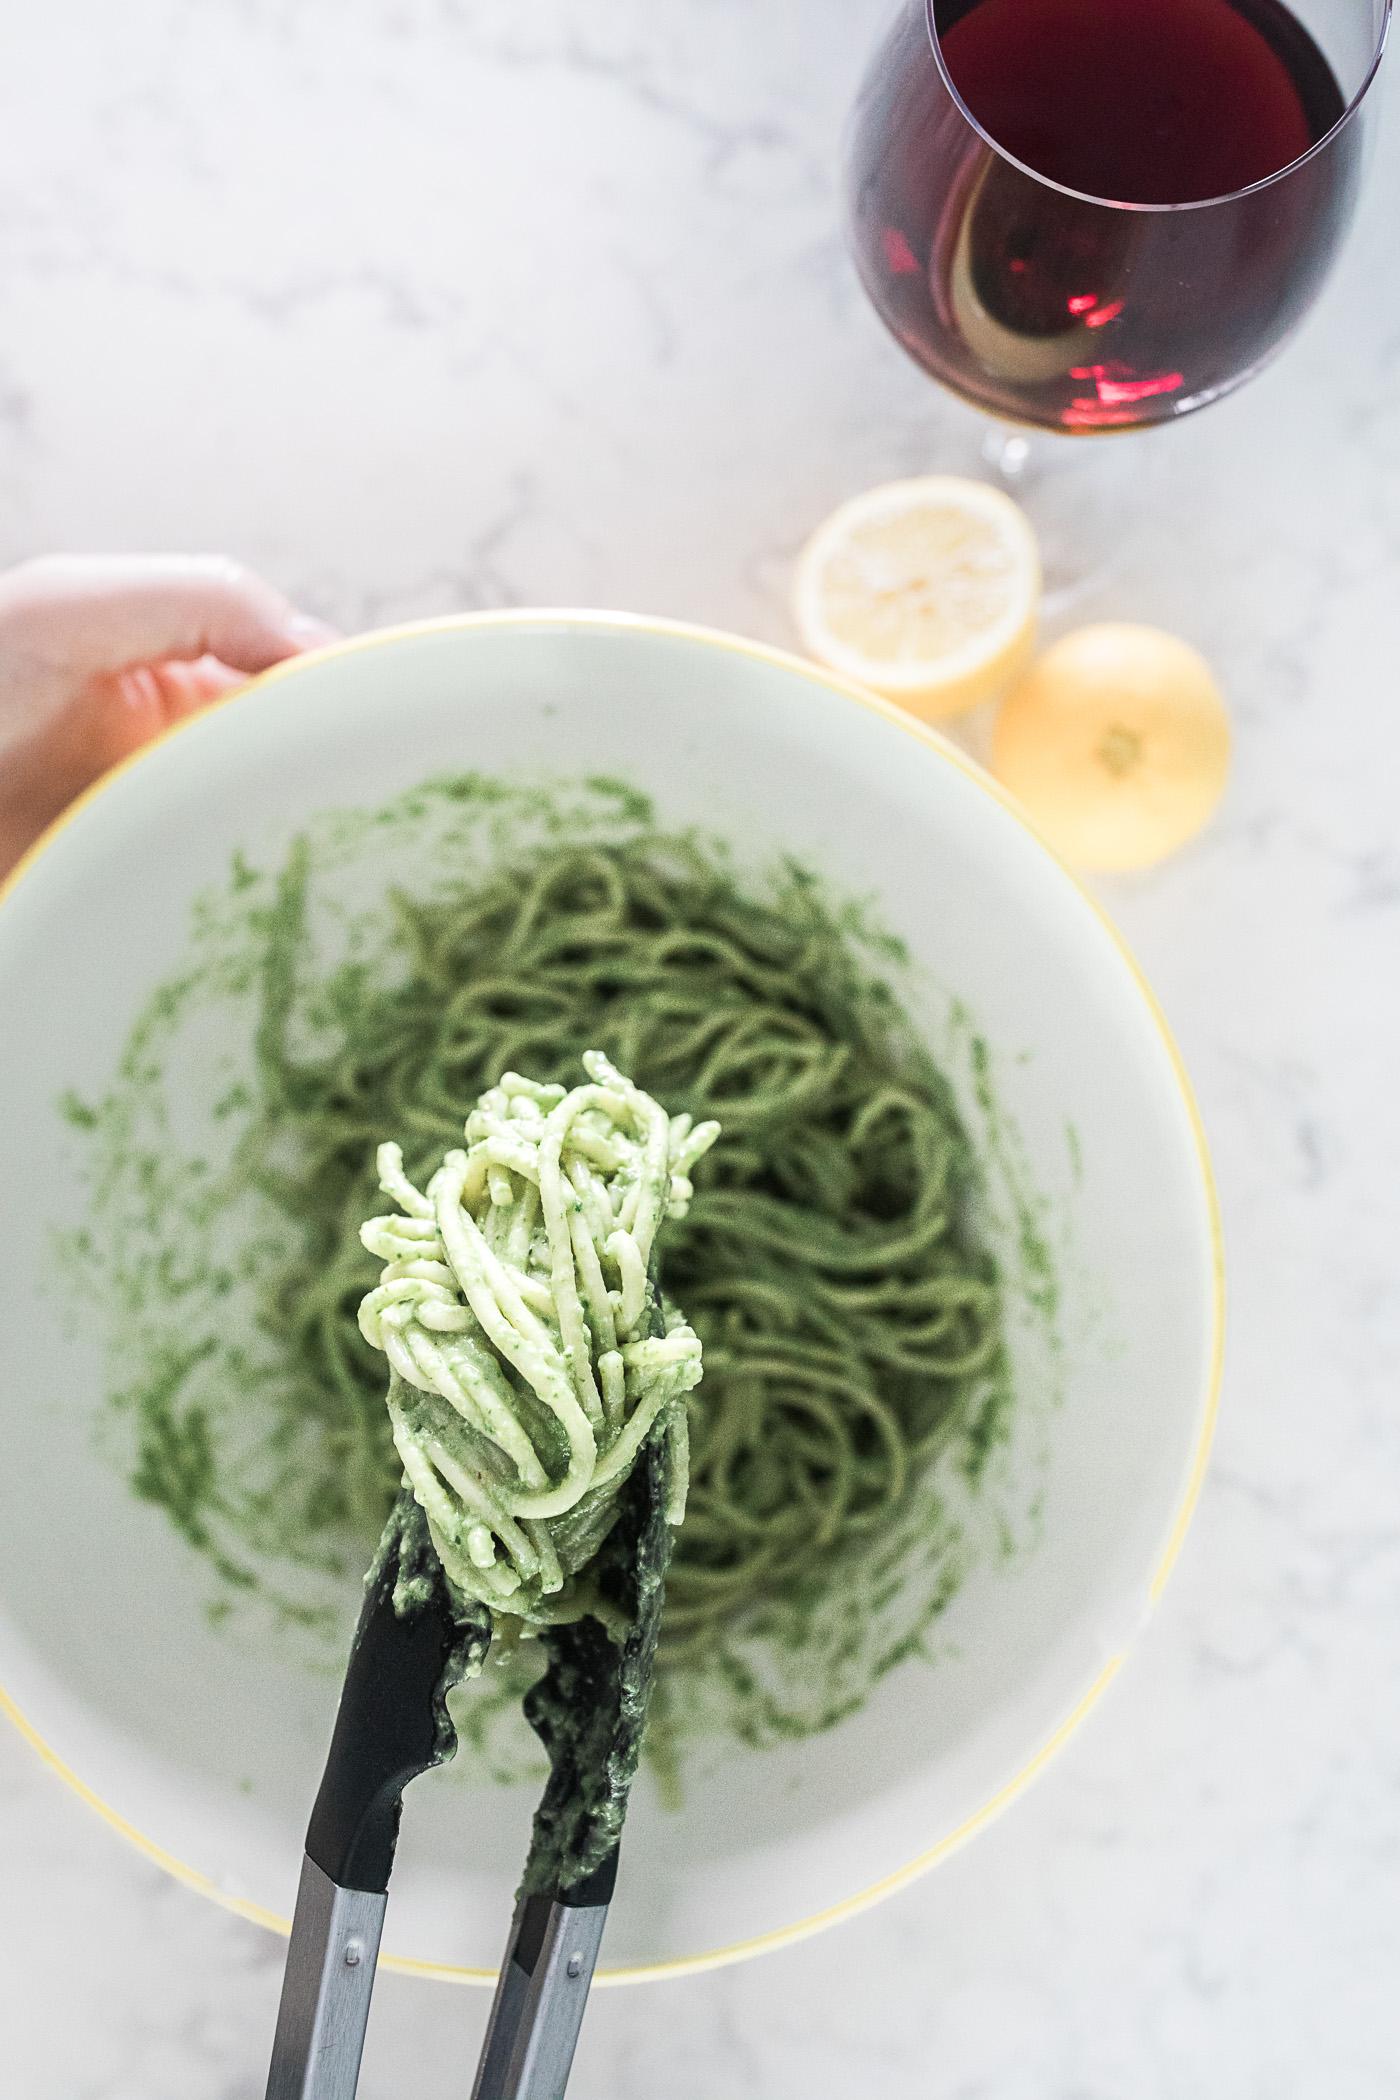 Pasta with Pesto | Freckled Italian